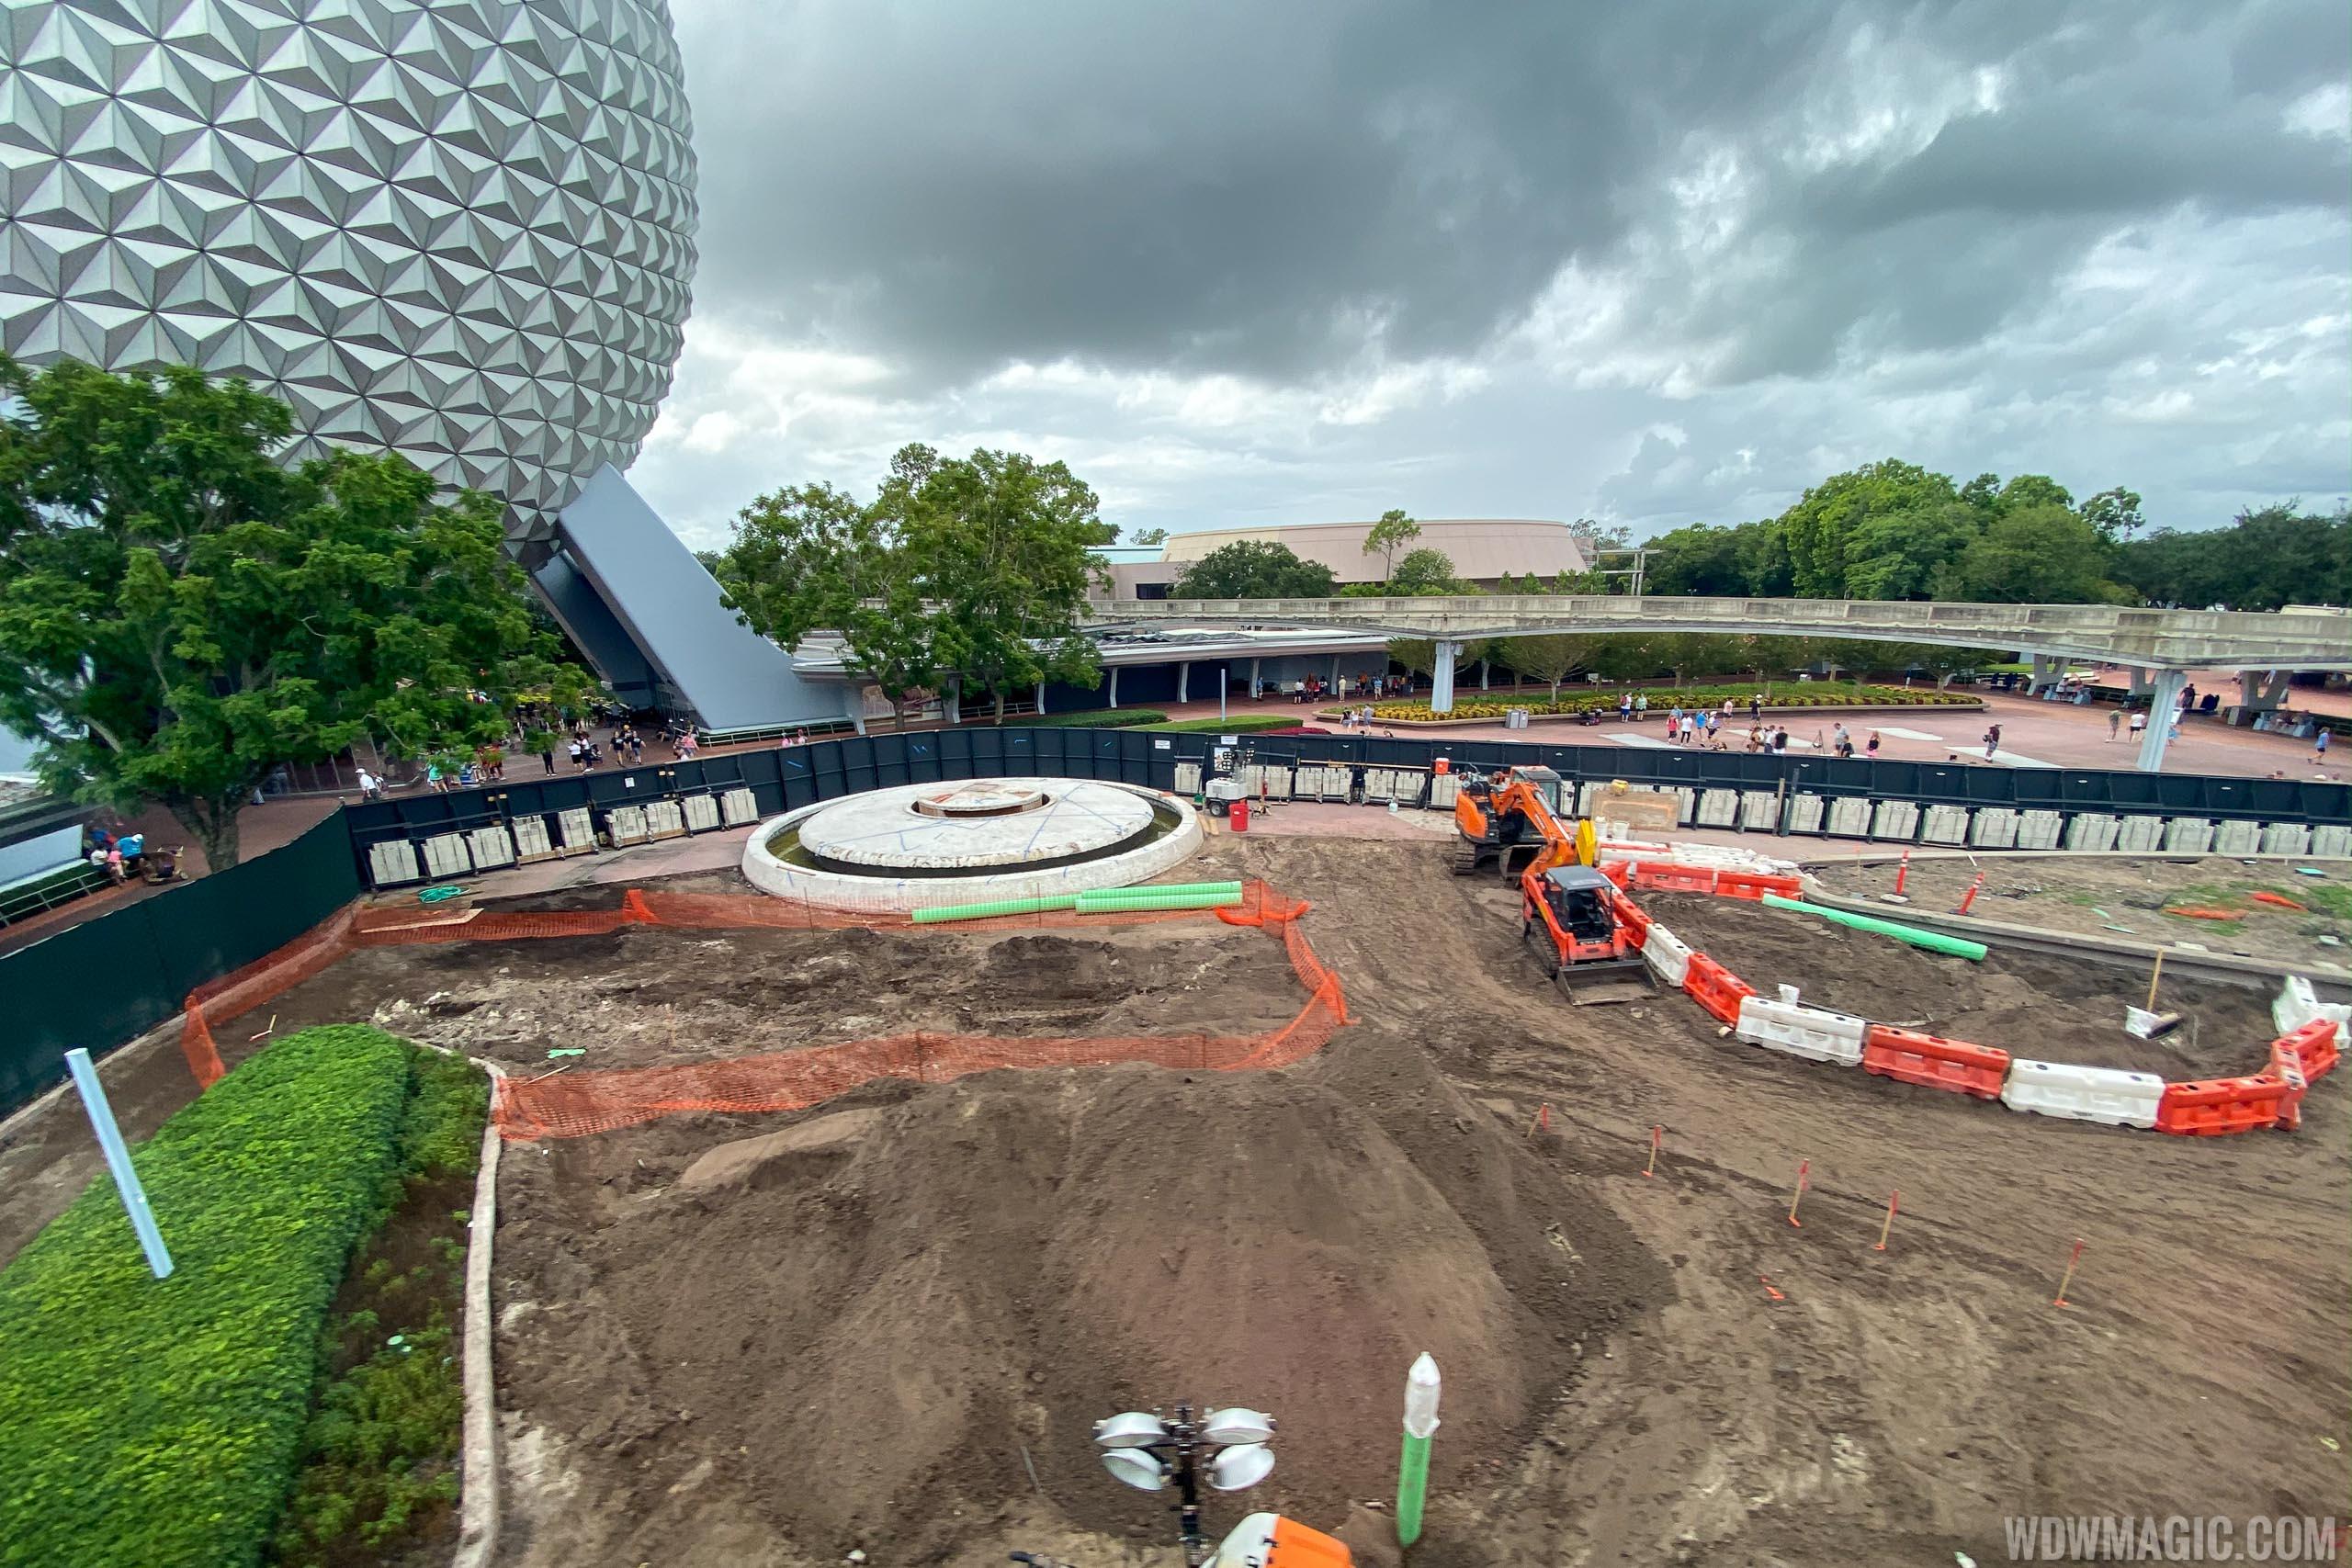 Epcot central area construction October 2019 - Entrance area